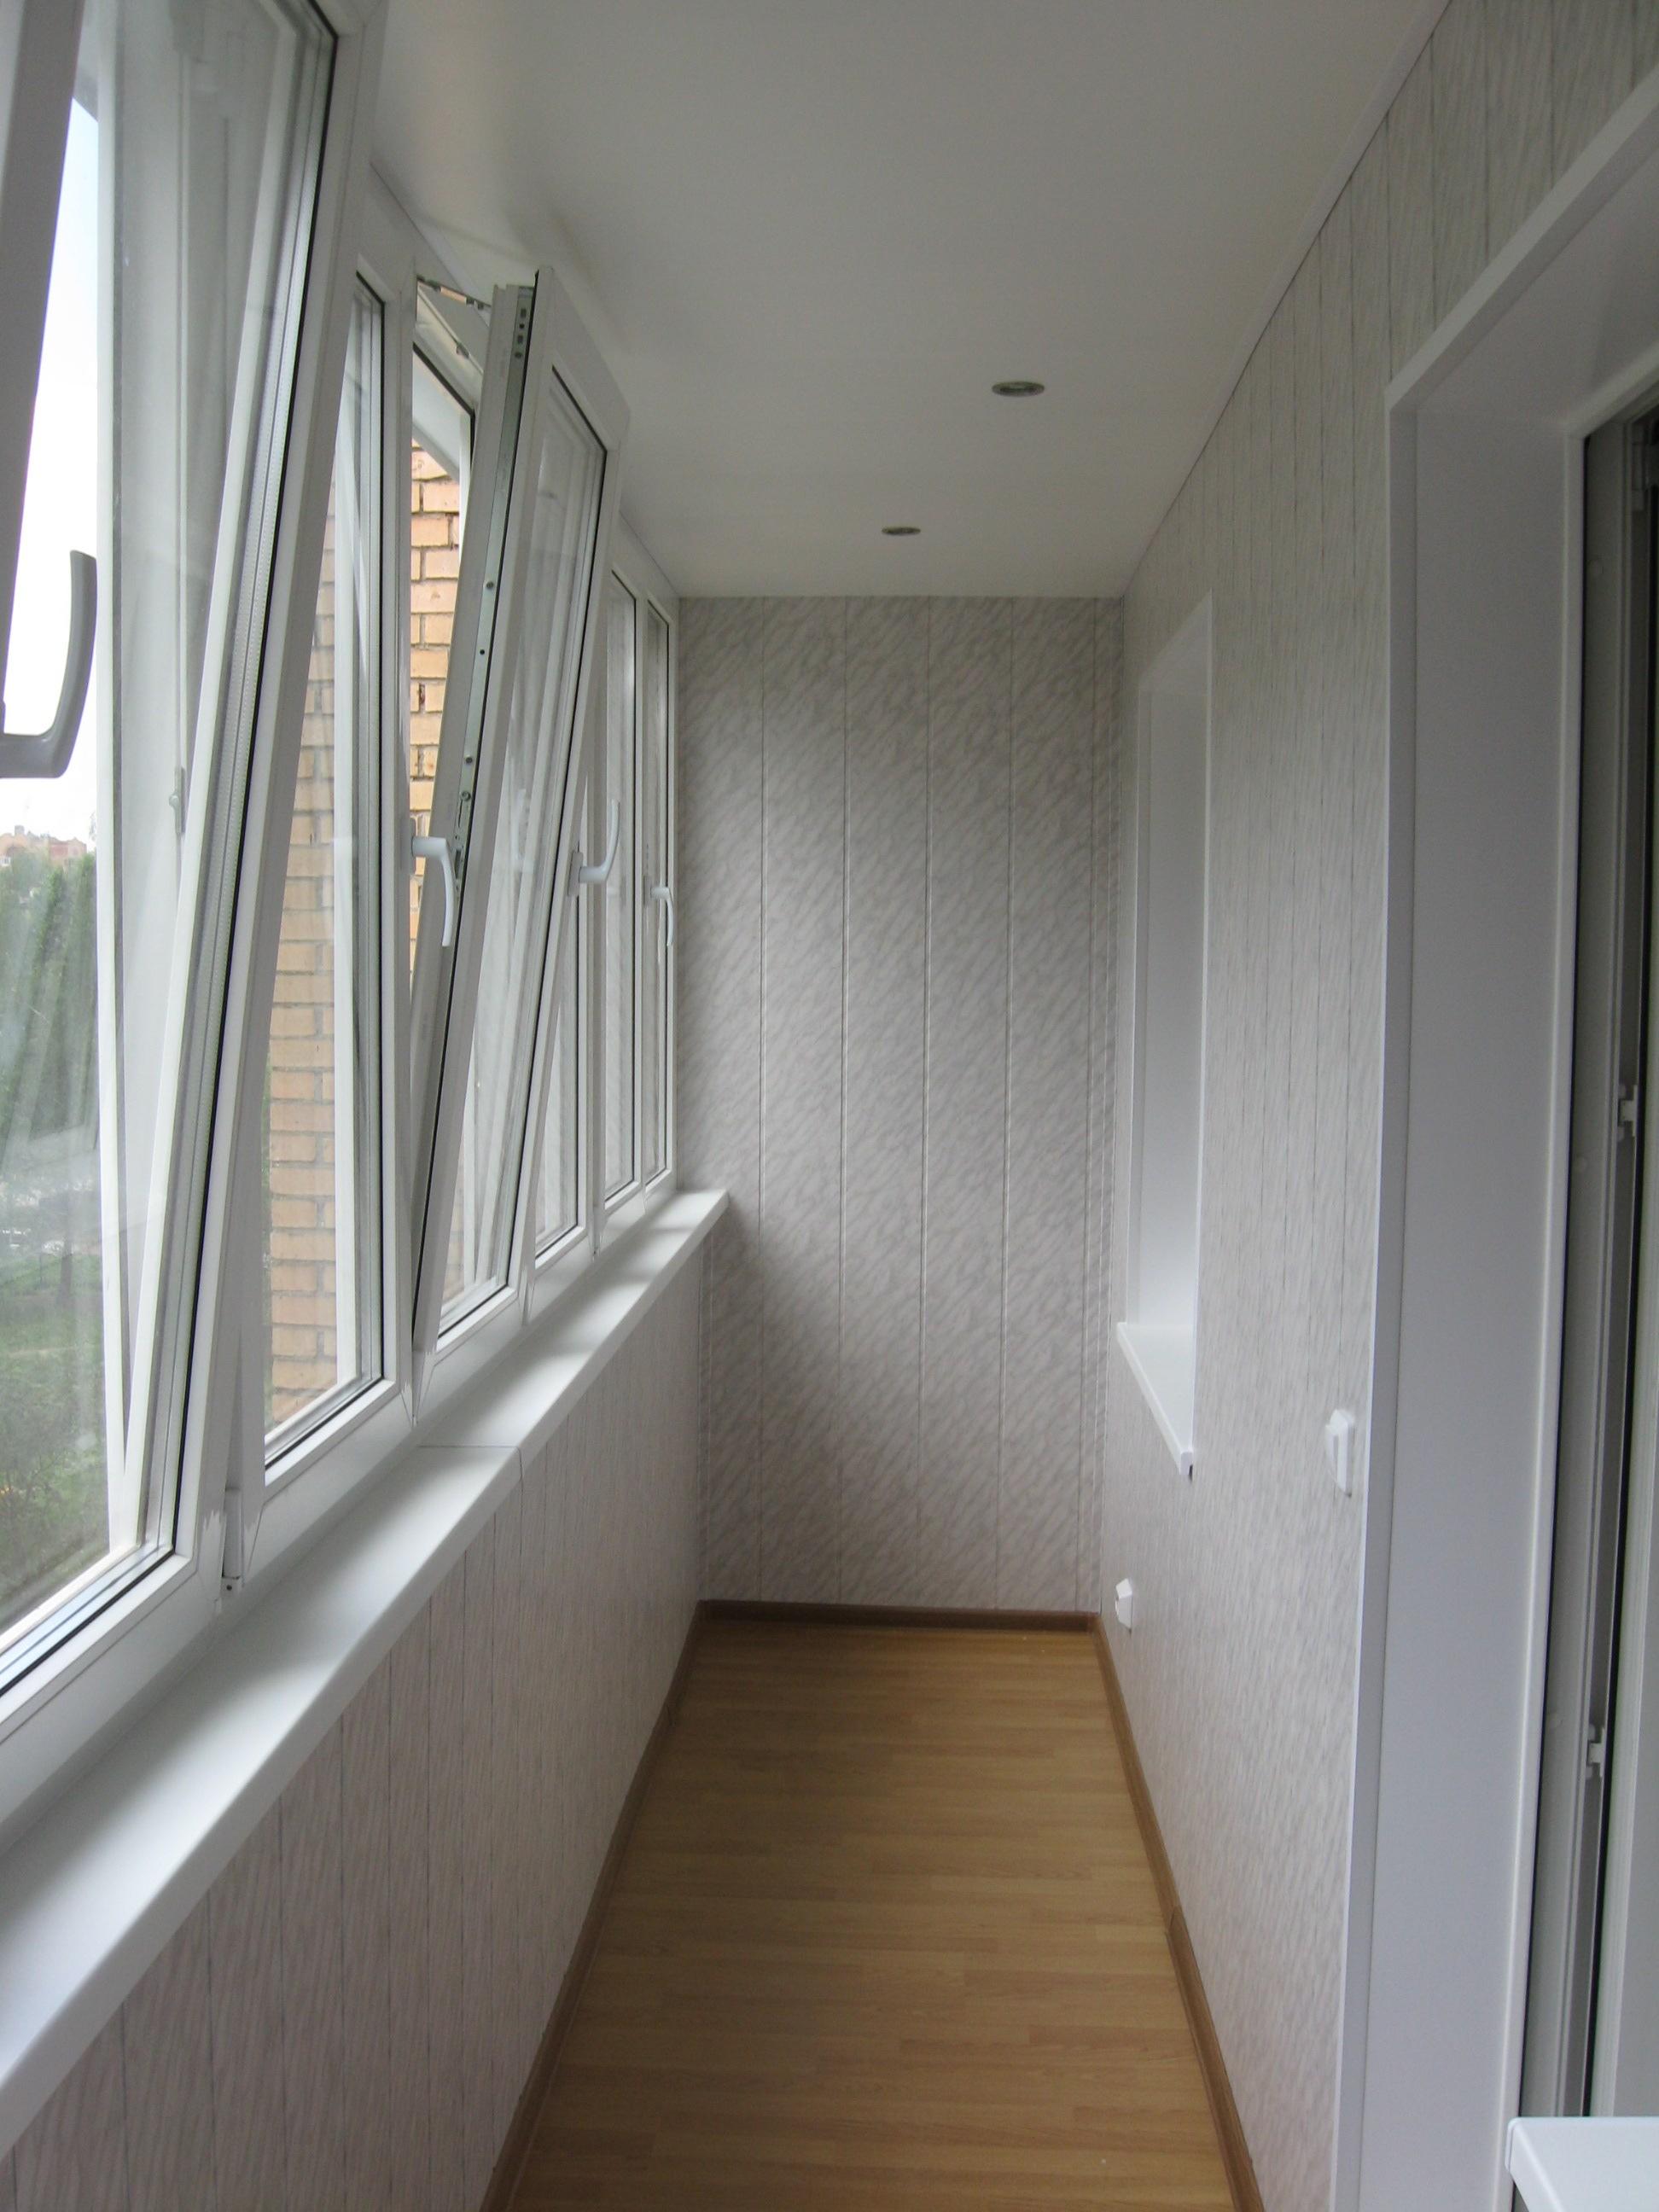 Обшивка балконов и лоджий панелями мдф, фото, видео, цены.